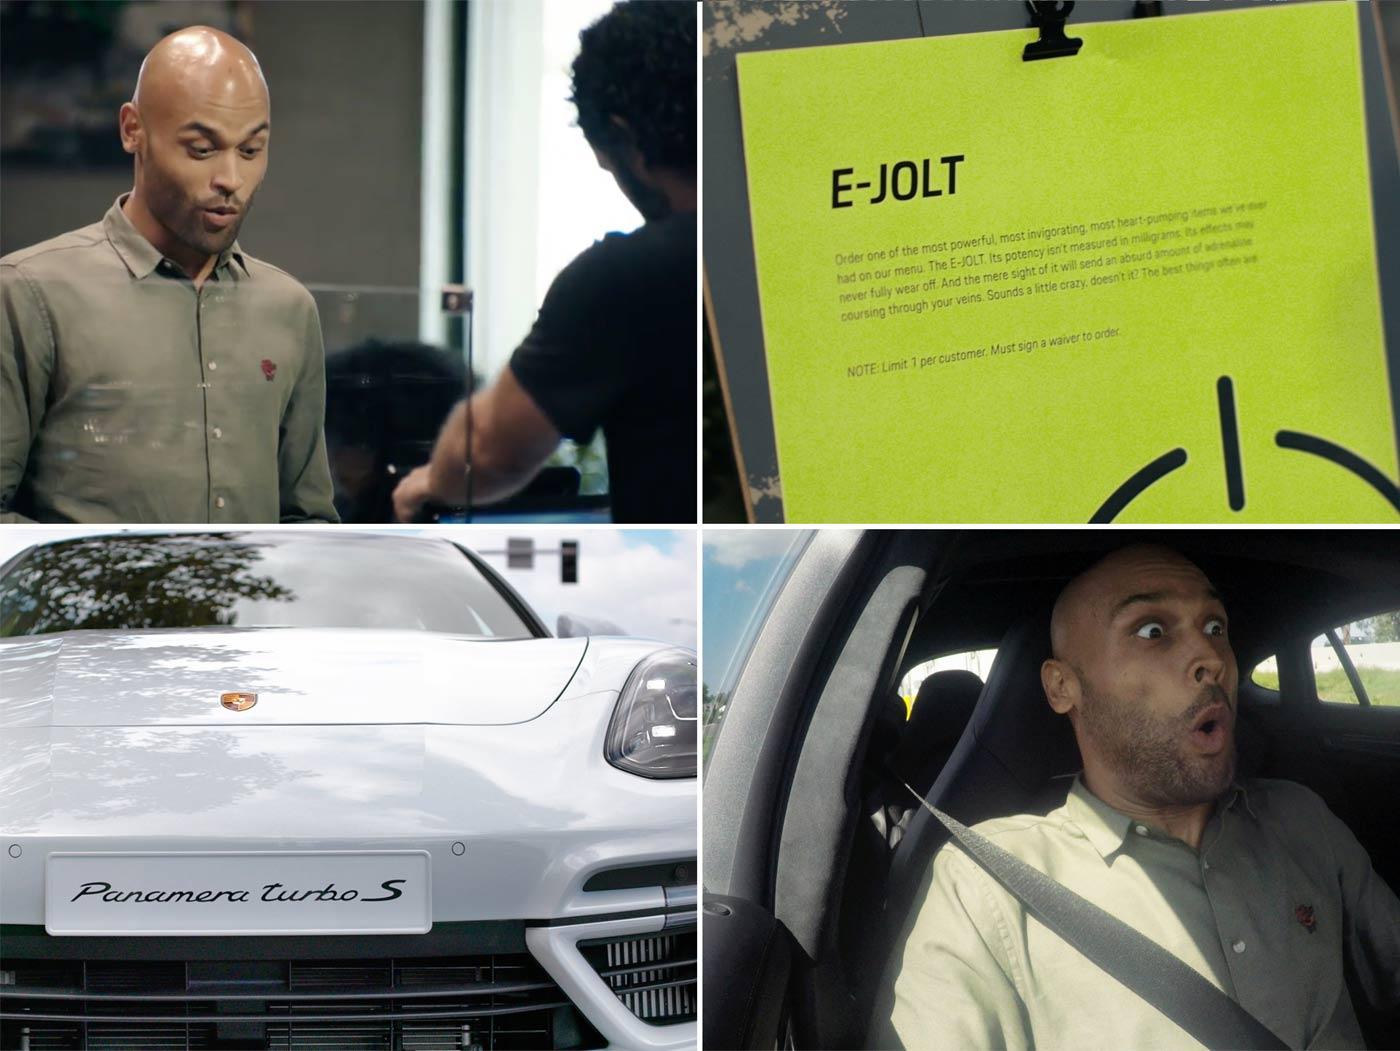 Porsche presents: The E-JOLT